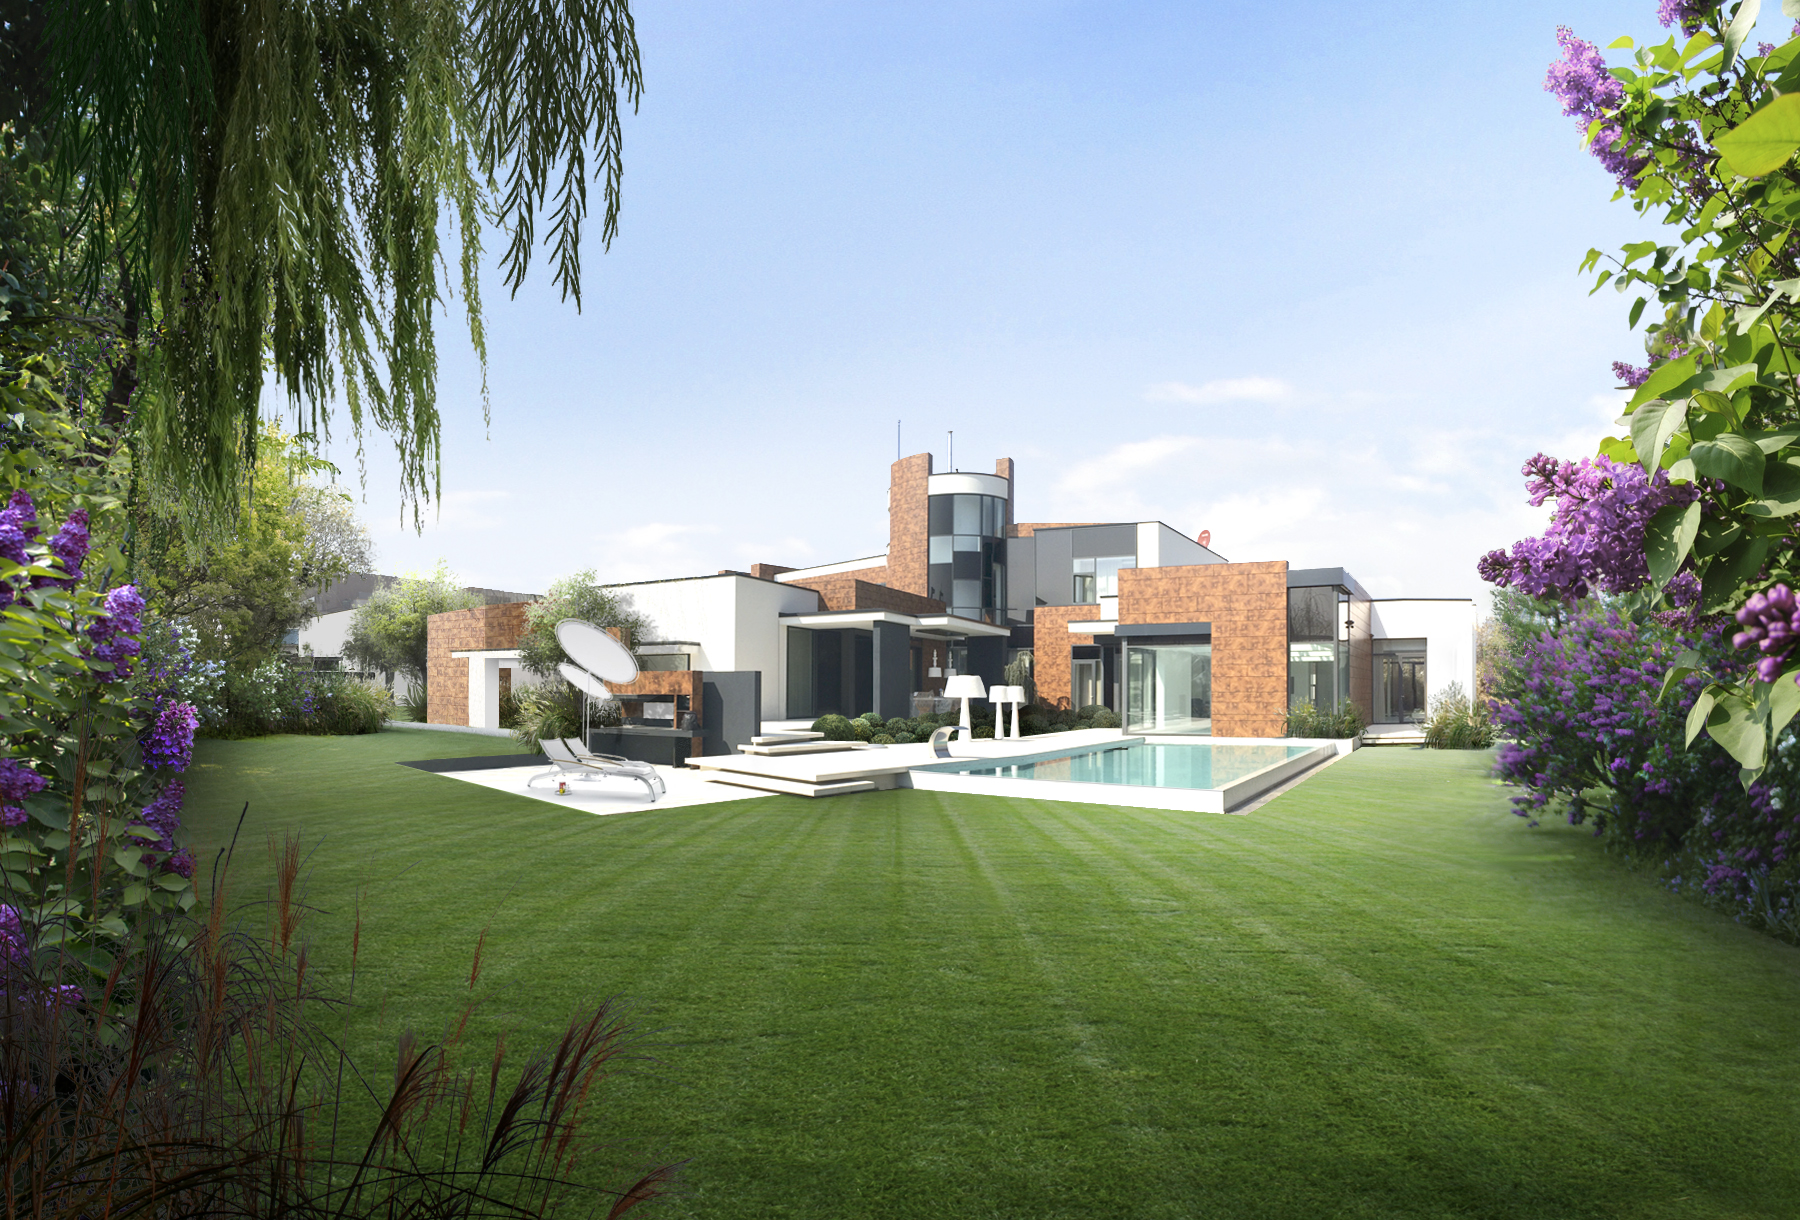 Villa moderna con giardino paghera rifare casa for Paghera giardini